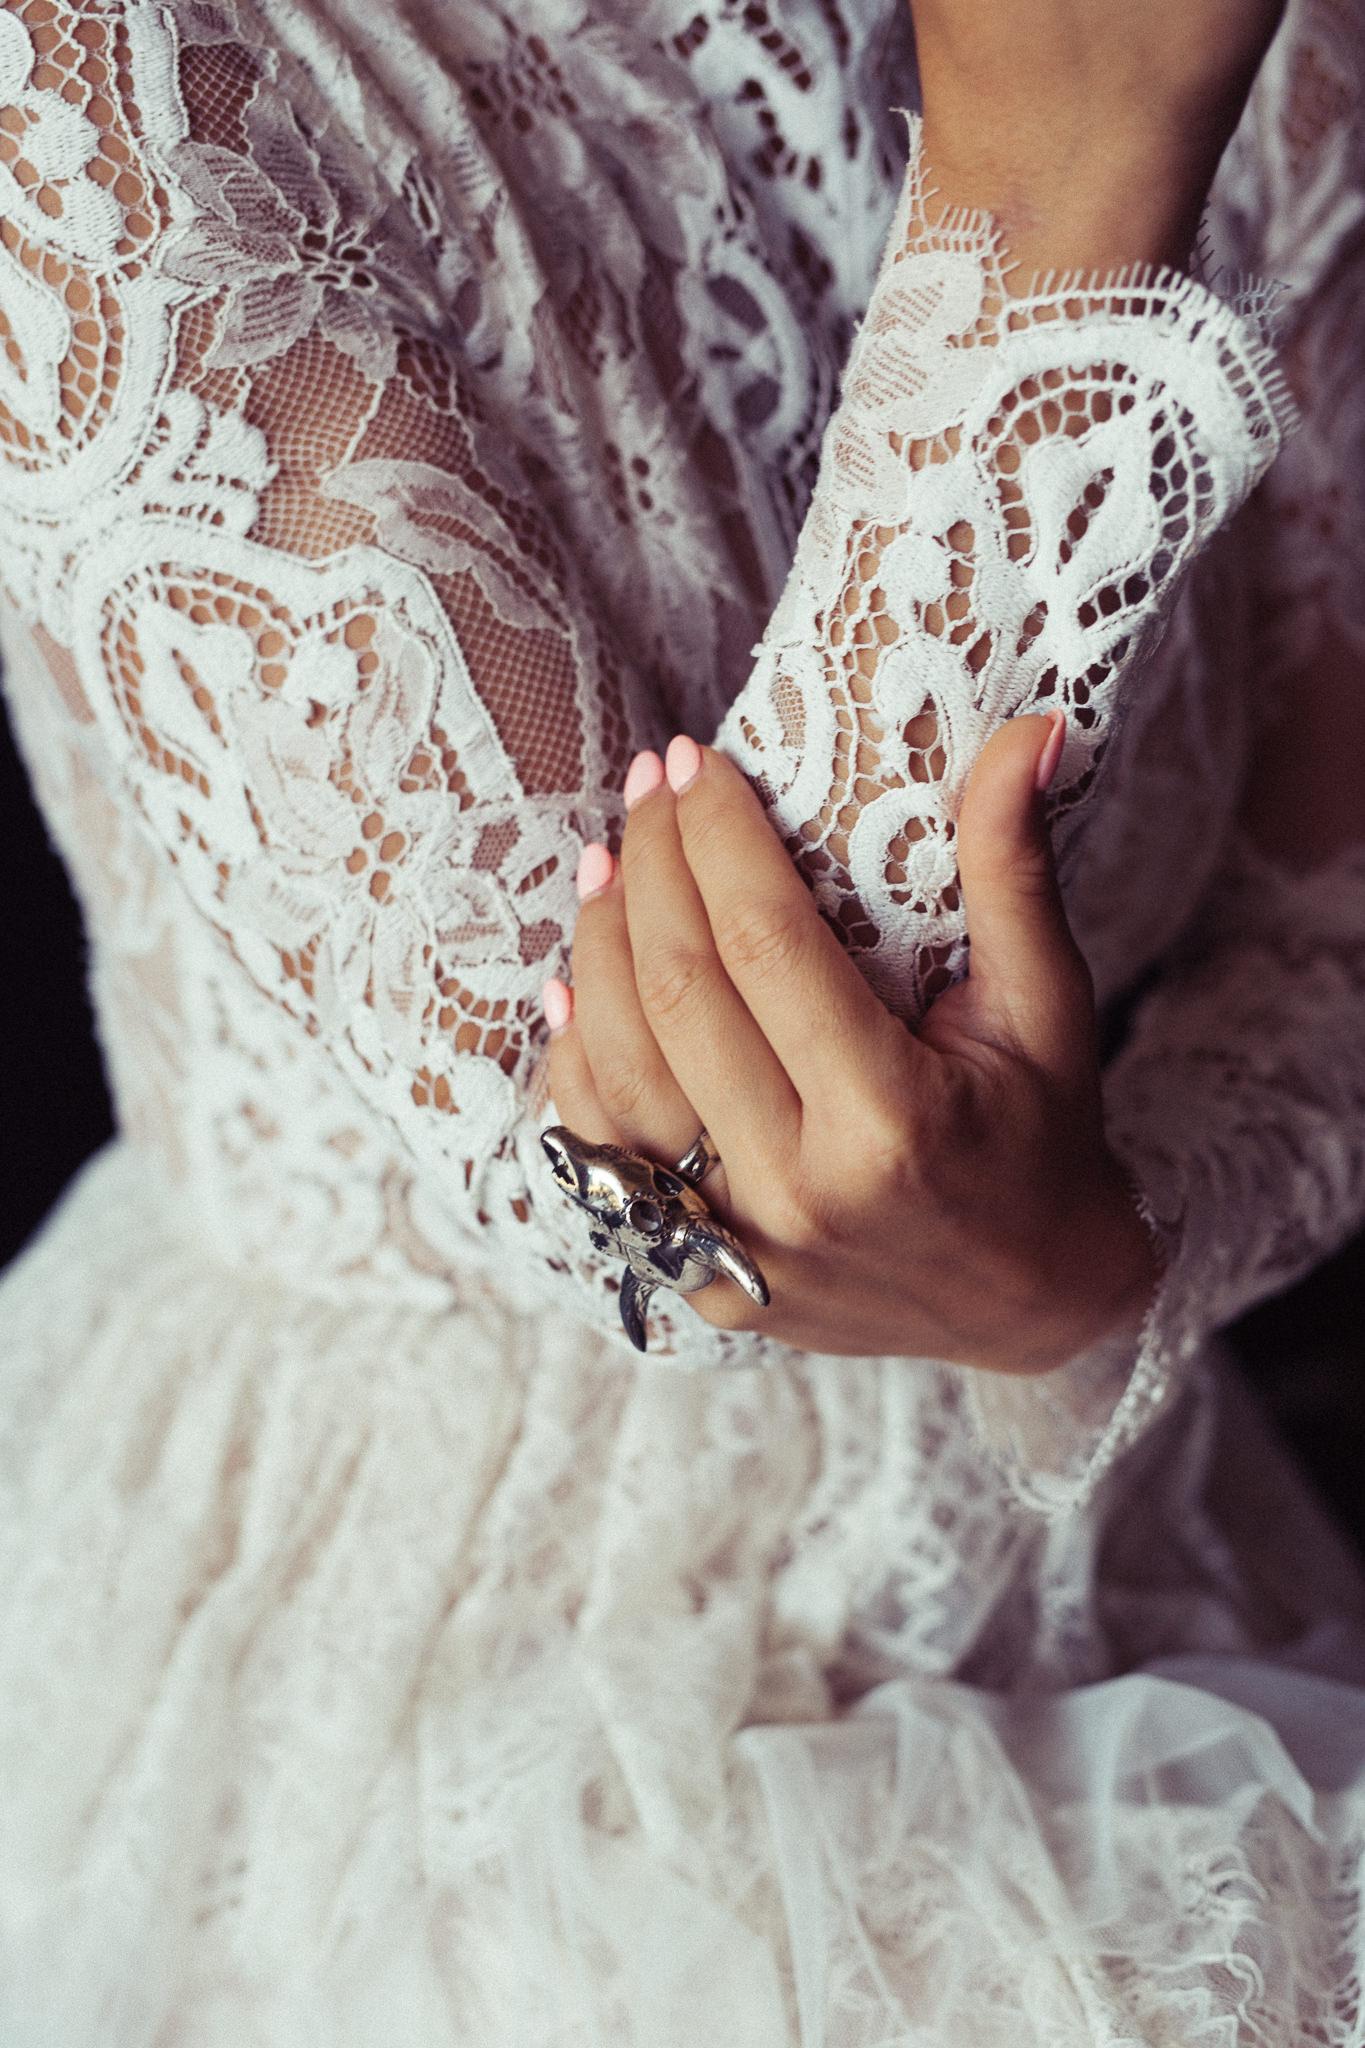 Dress close up | Image courtesy of Adj Brown